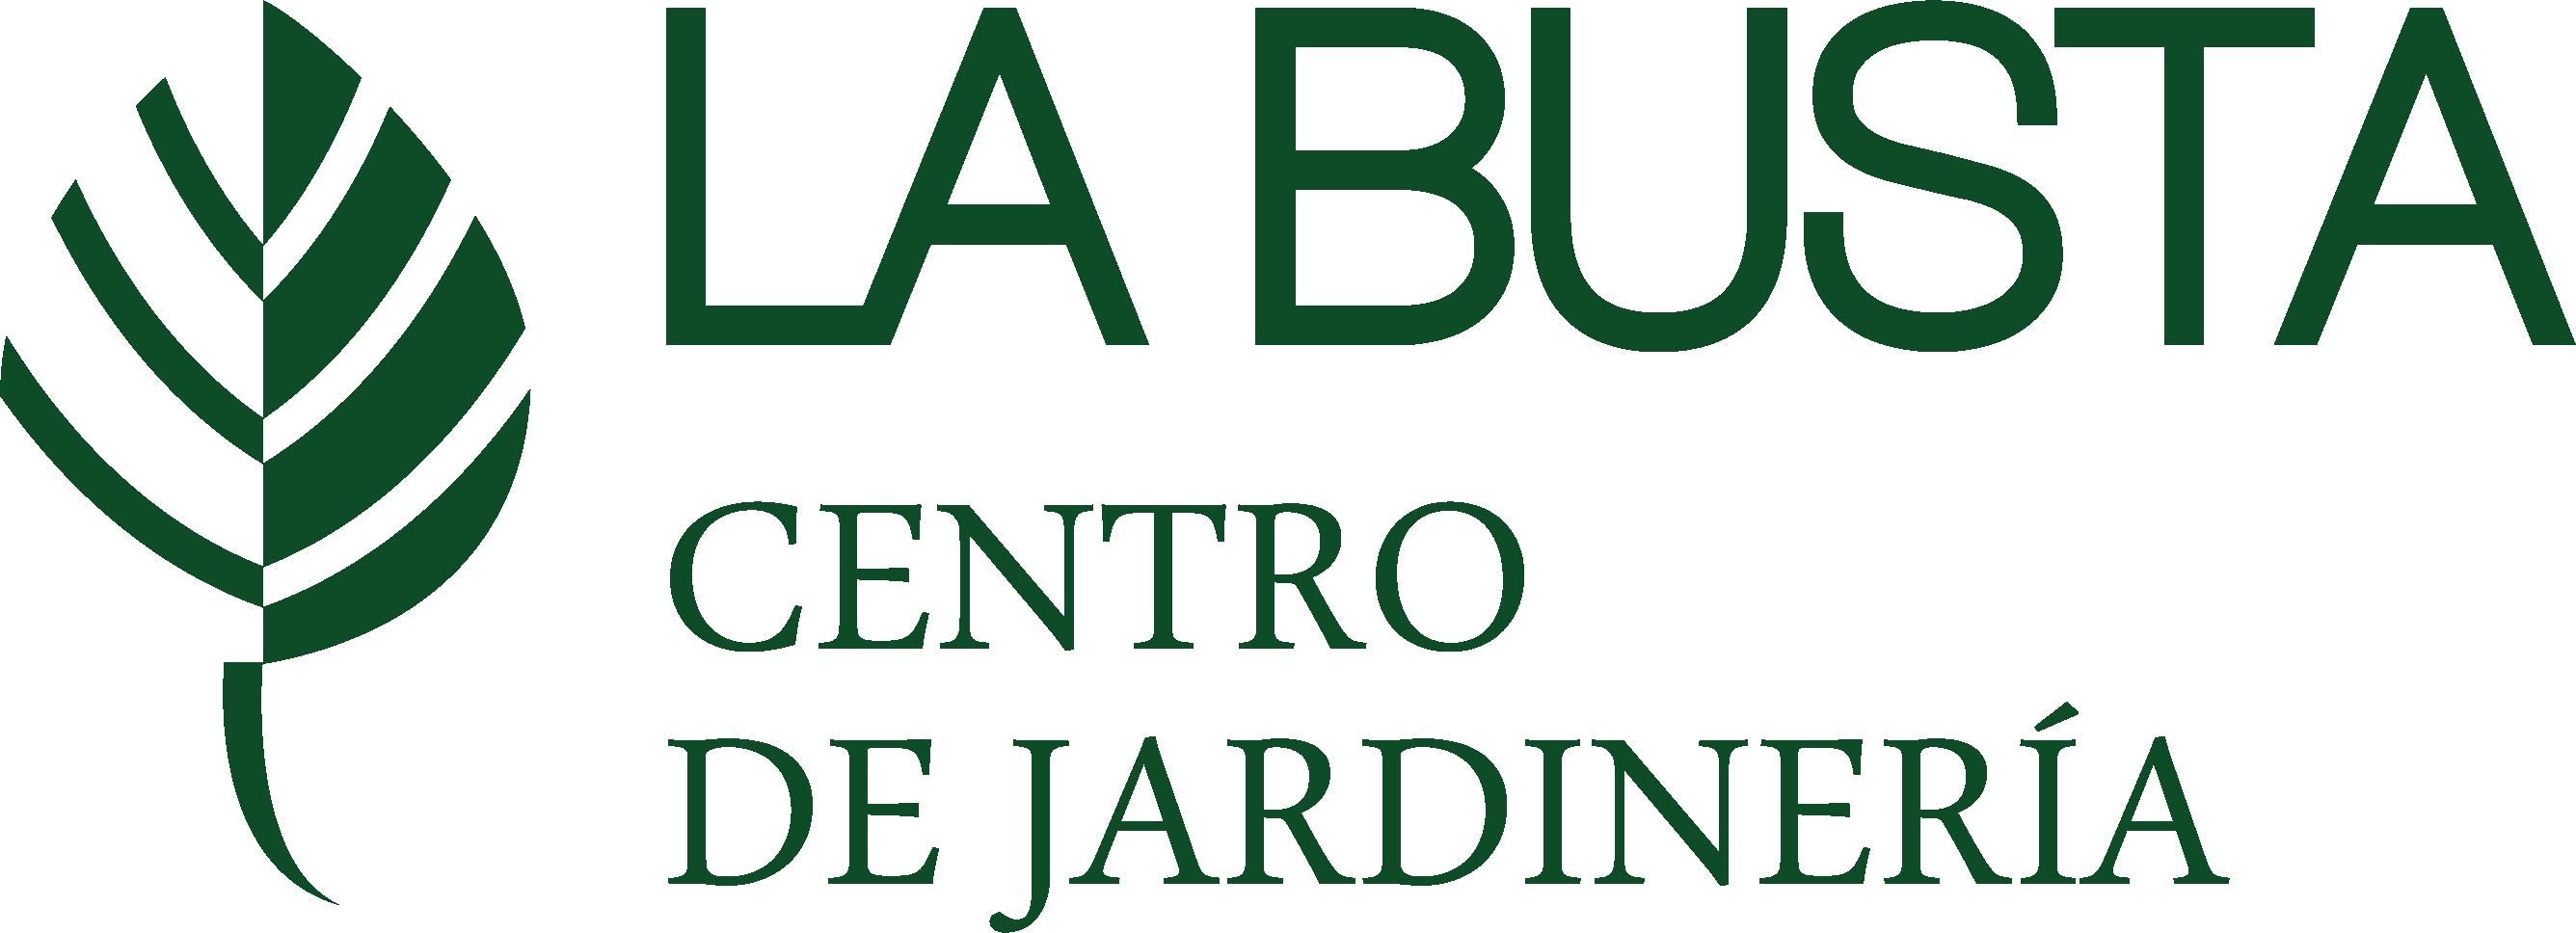 La busta centro de jardineria for Centro de jardineria